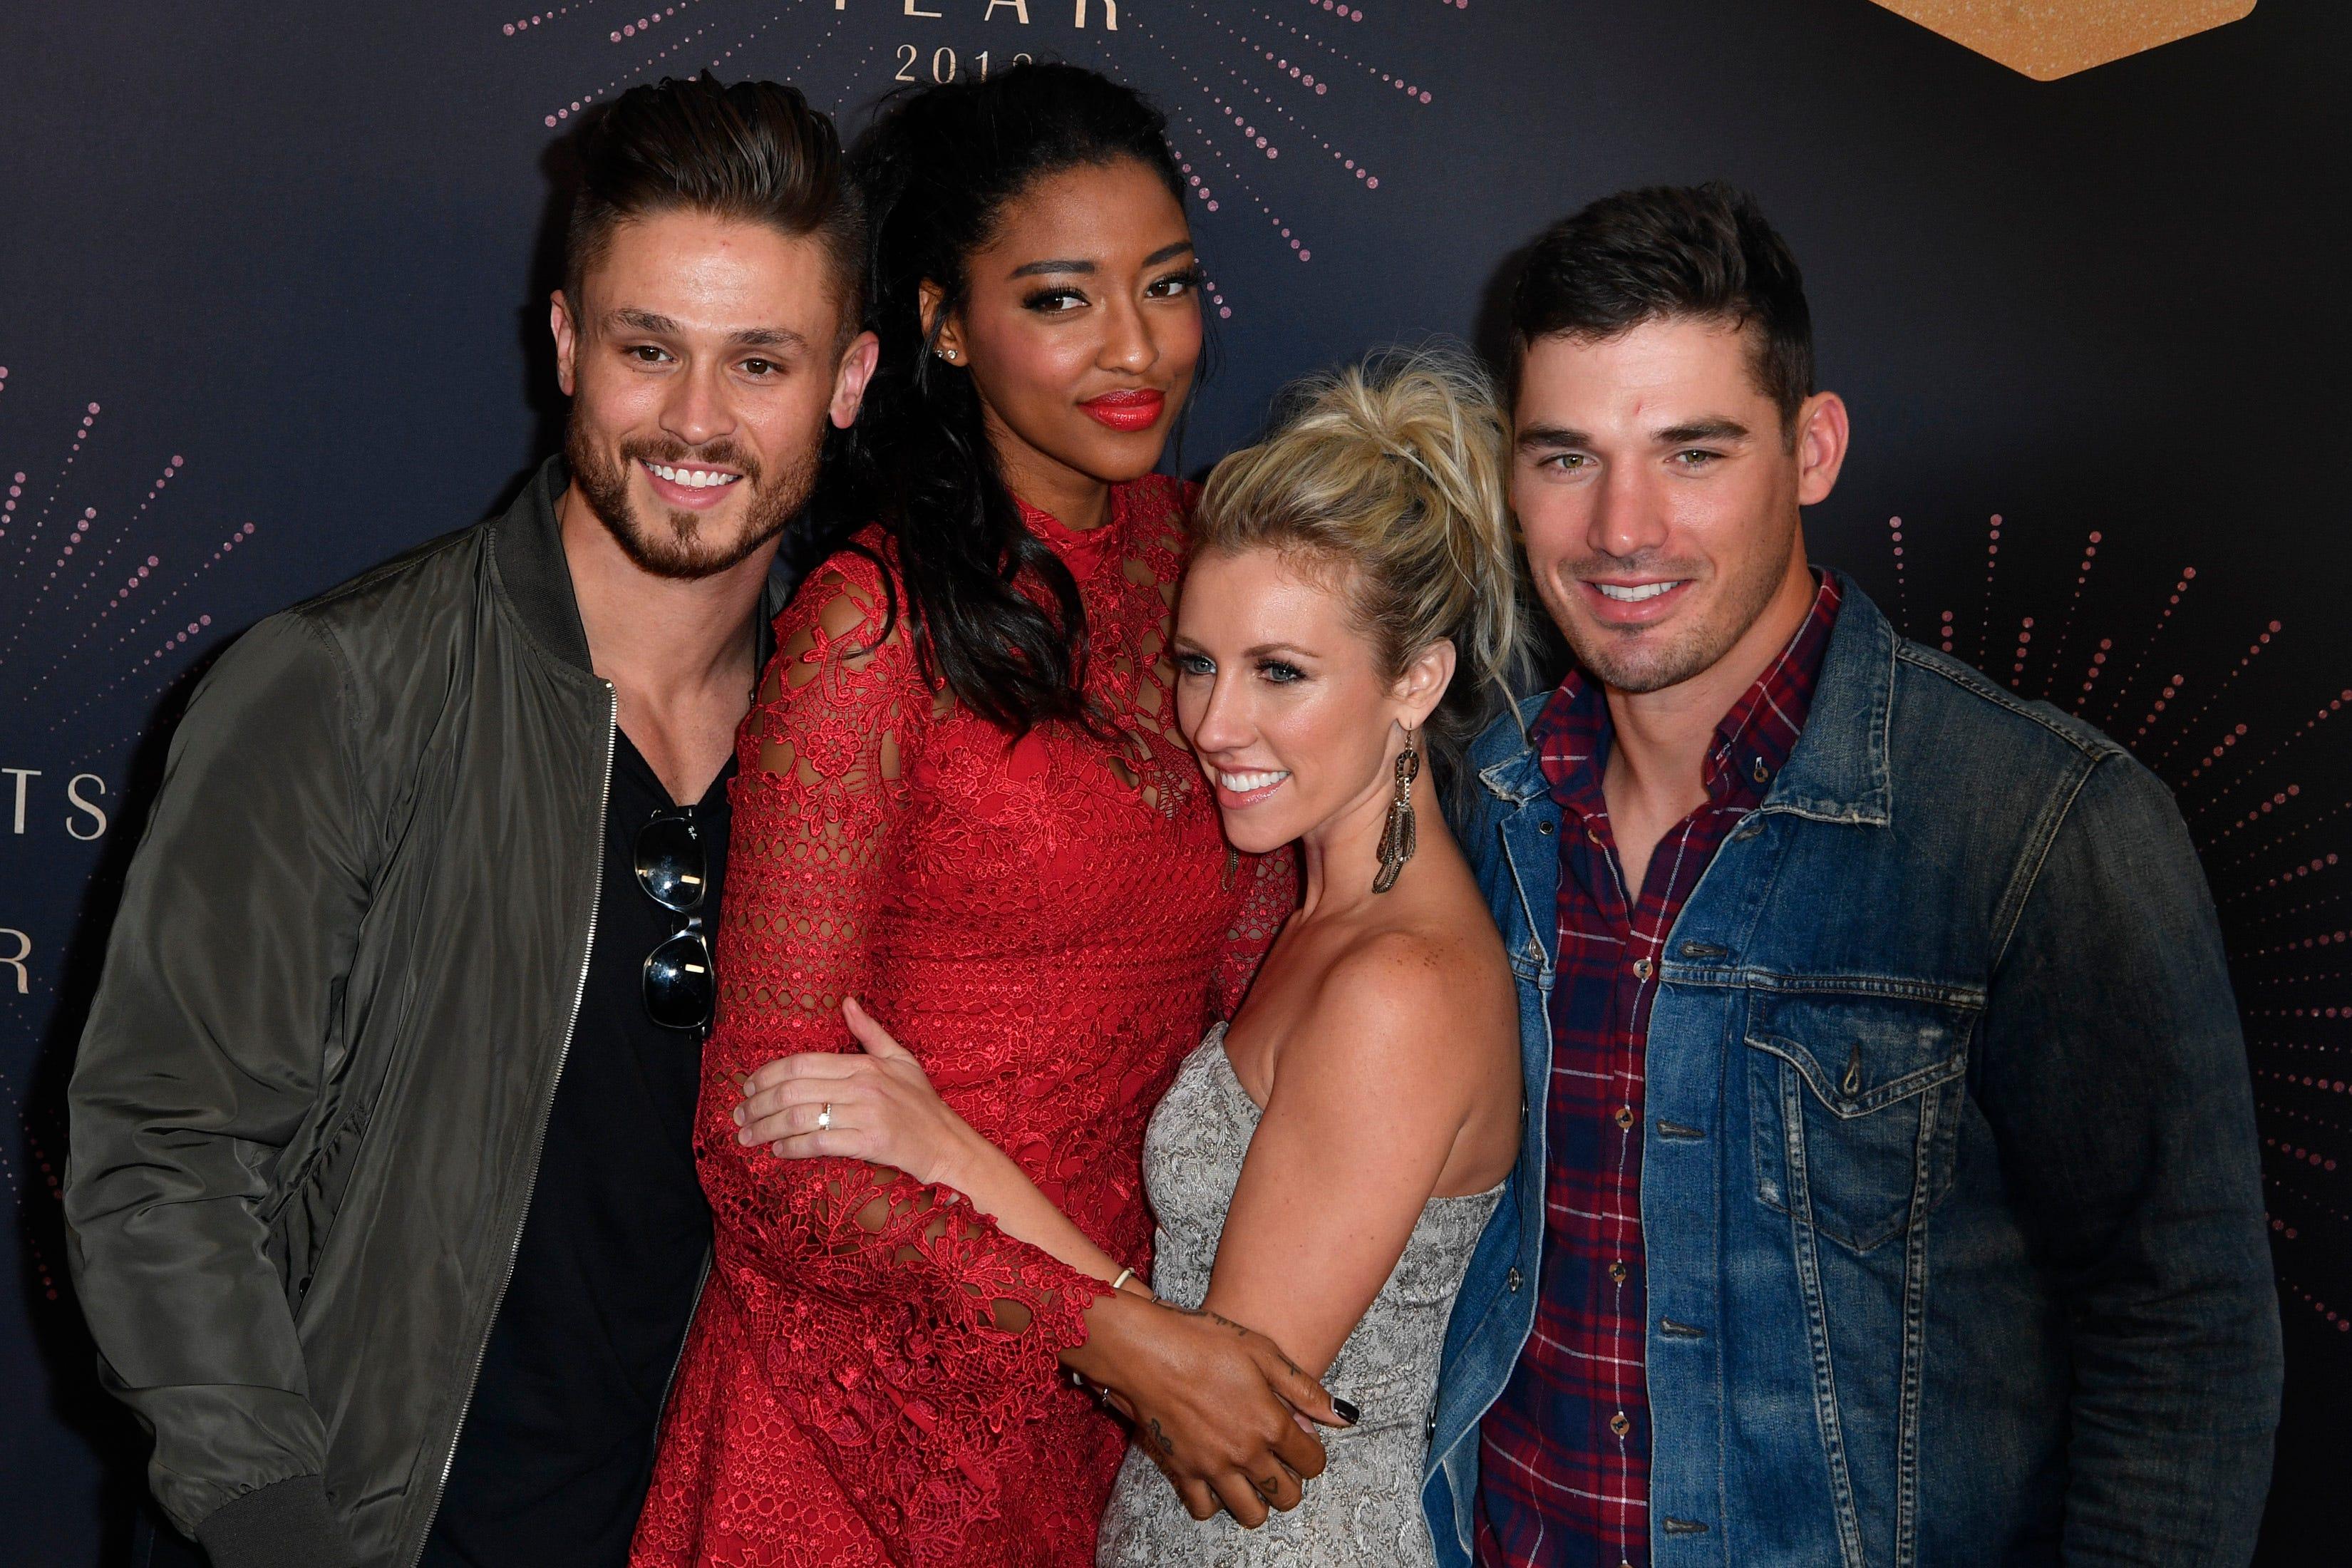 Nashville cast season 2 – USPosts